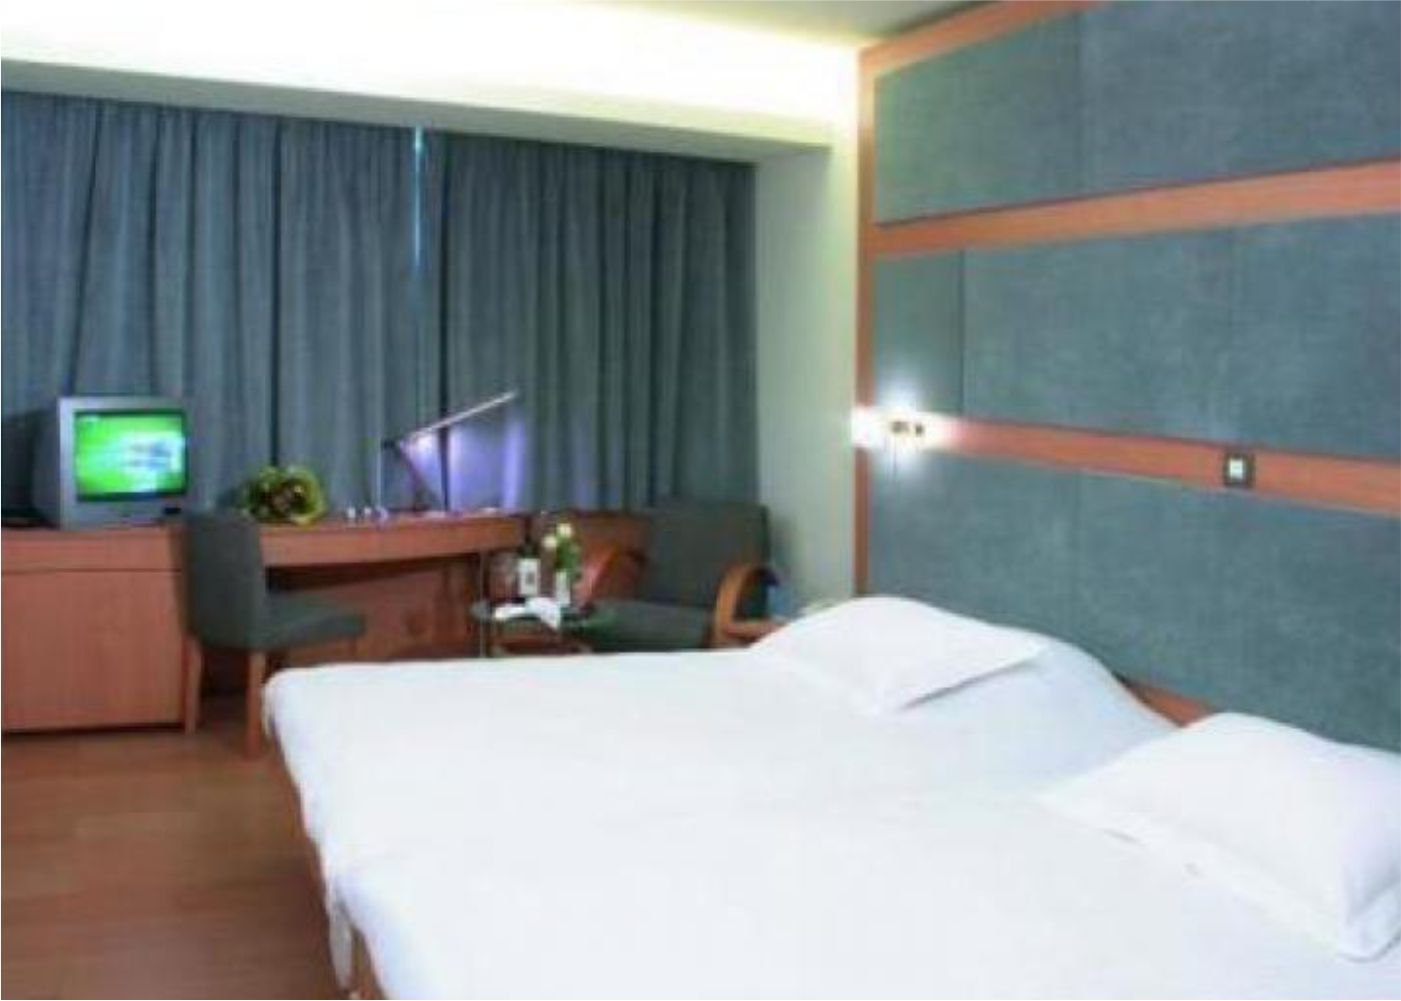 paraskevi-interior-kaningos-21-hotel-3